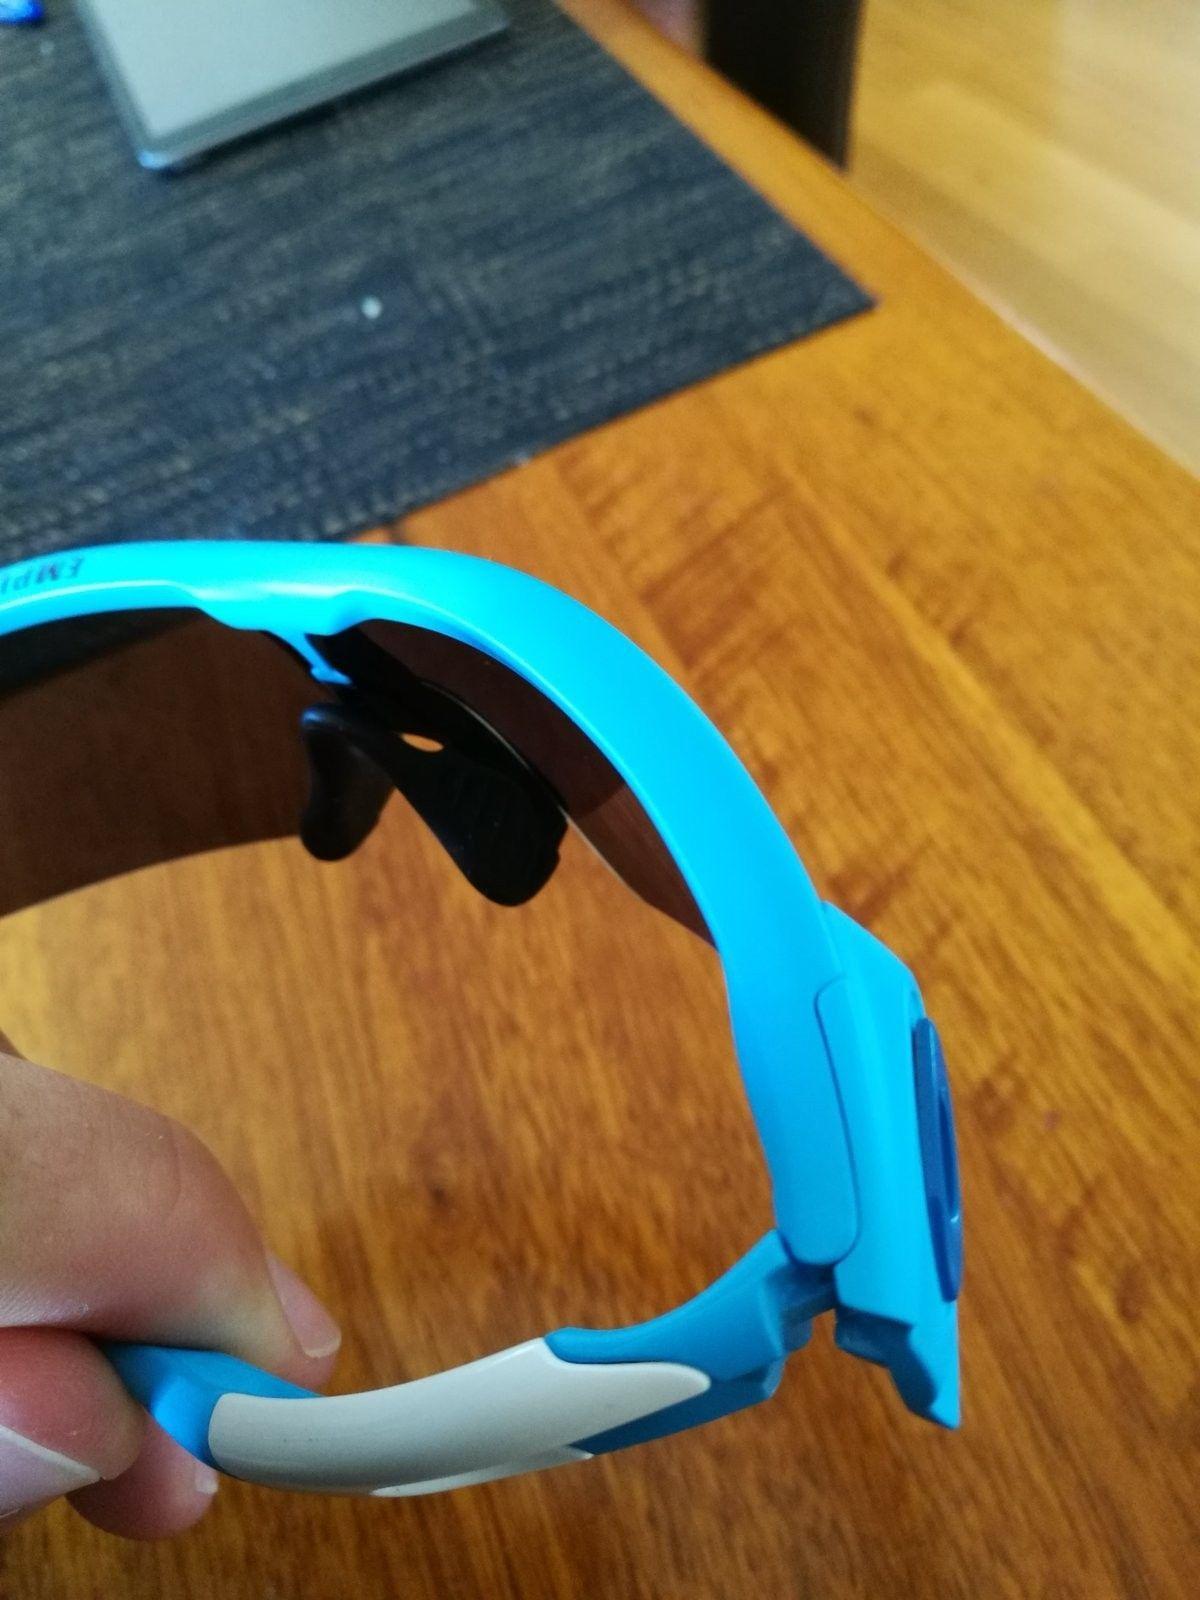 Radarlock XL Glacier blue help!: Not sure if Authentic or not - IMG_20160720_134611.jpg